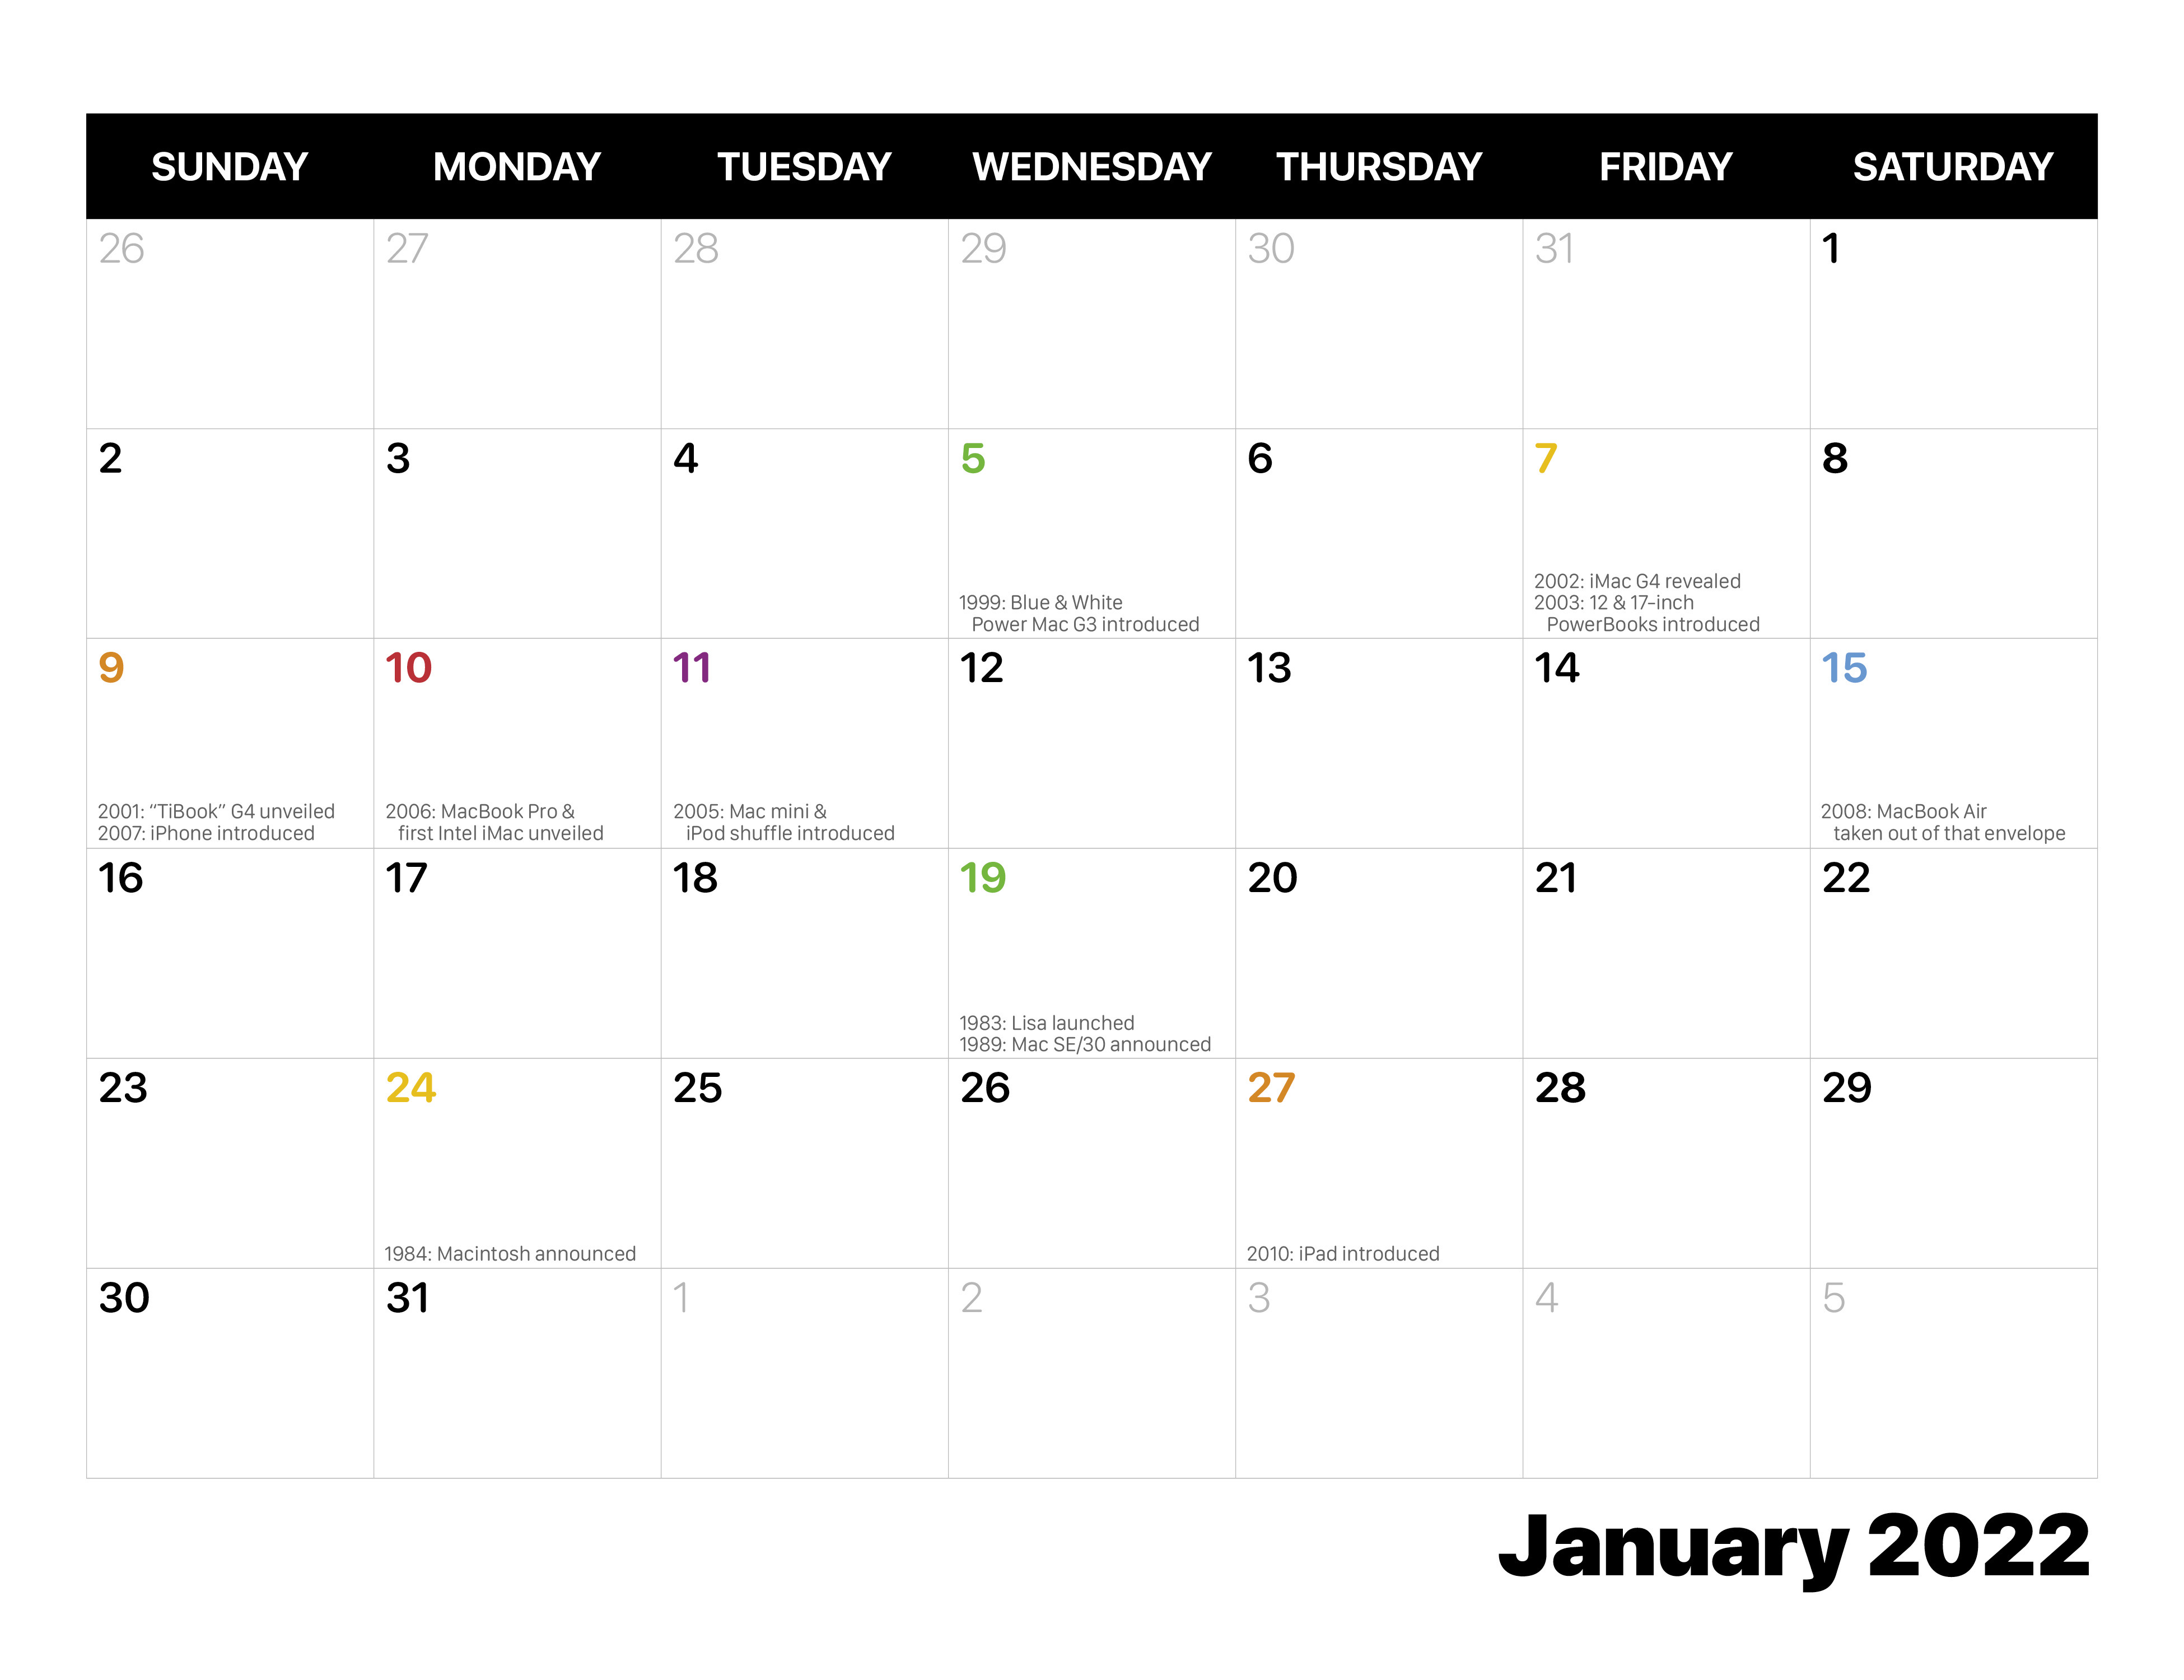 January 2022